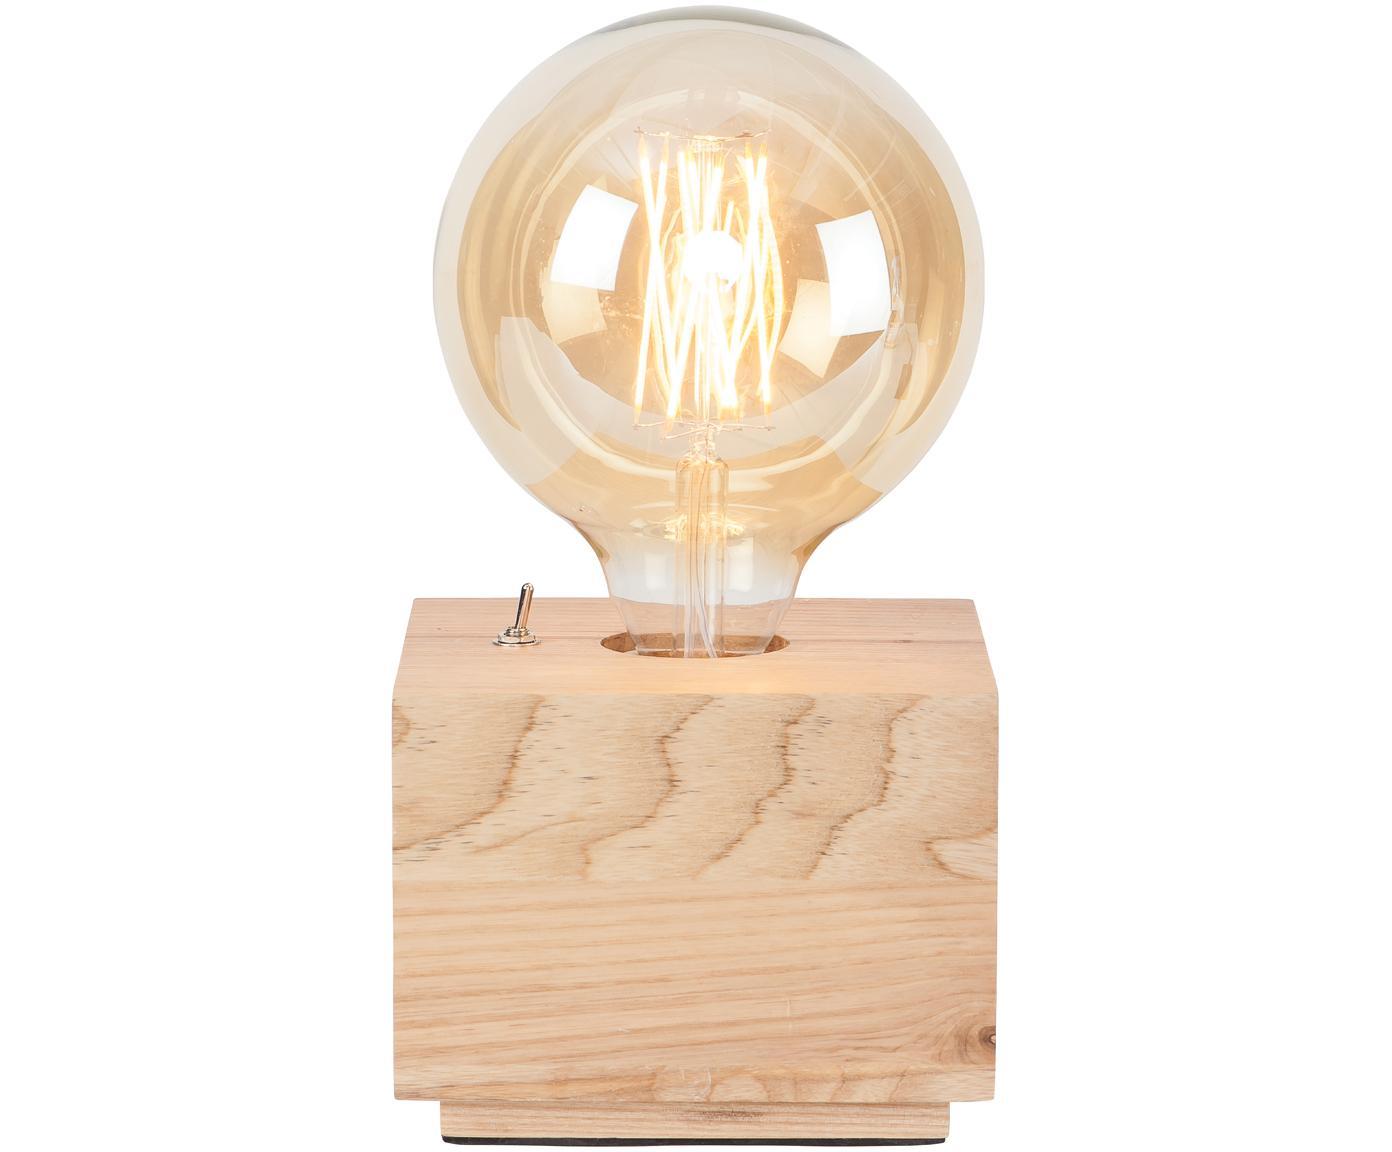 Tafellamp Kobe Square van essenhout, Lamp: essenhout, Essenhout, 13 x 10 cm